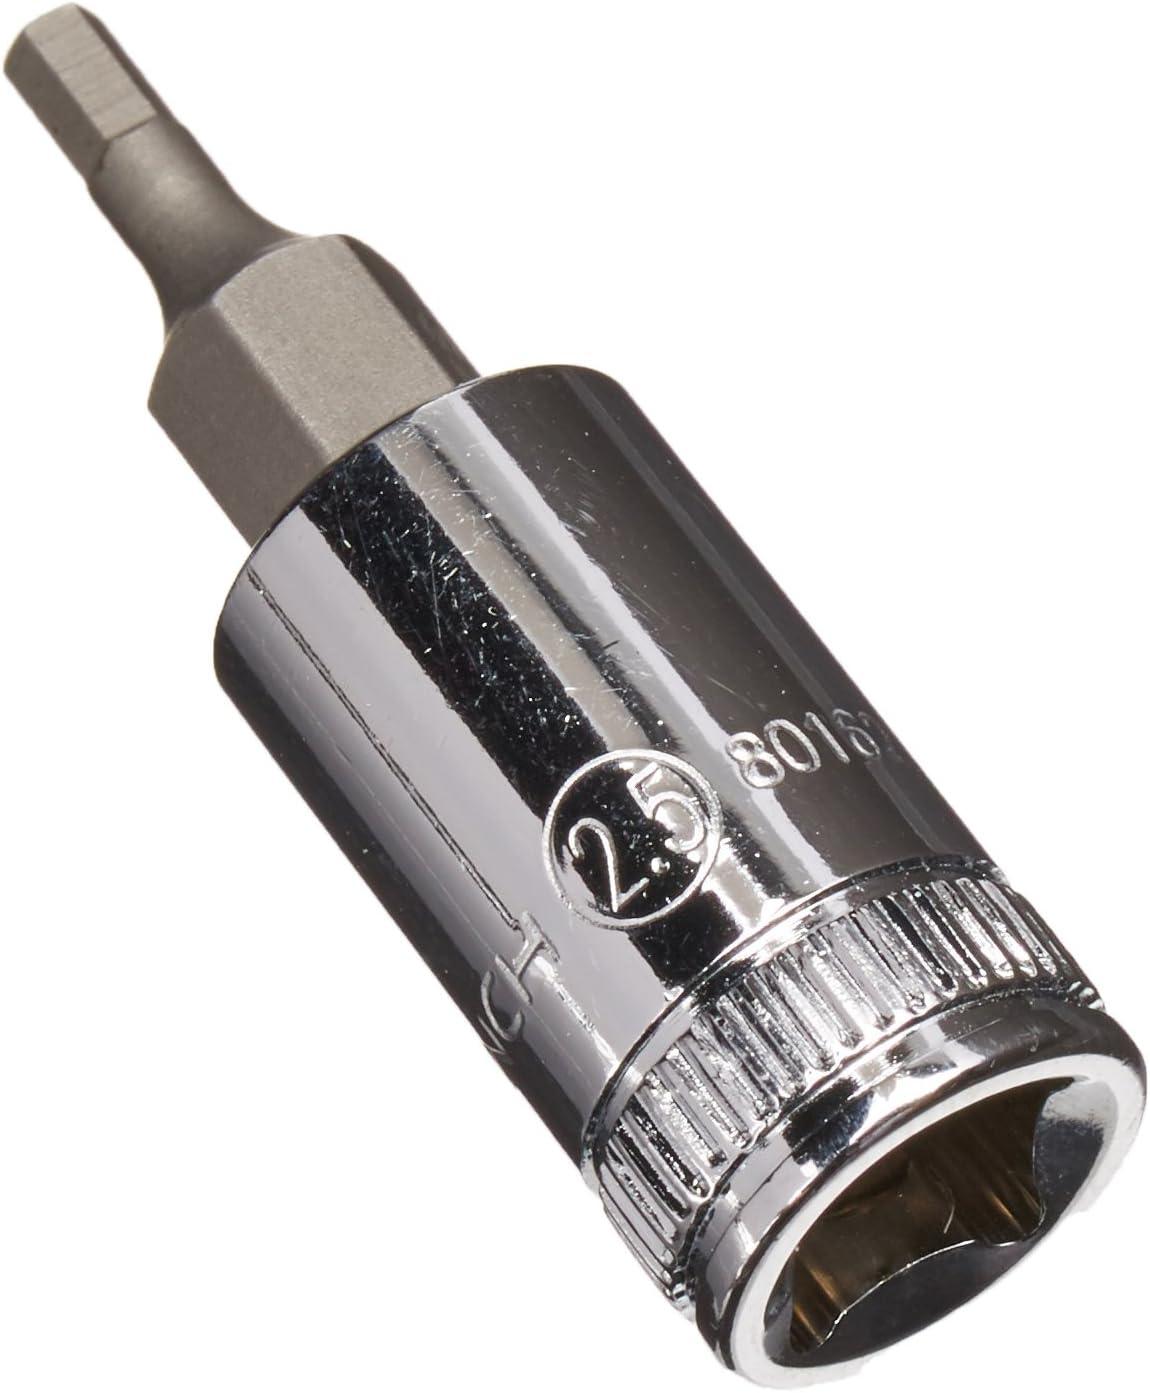 GEARWRENCH 1//4 Drive Hex Bit Metric Socket 2.5mm 80162